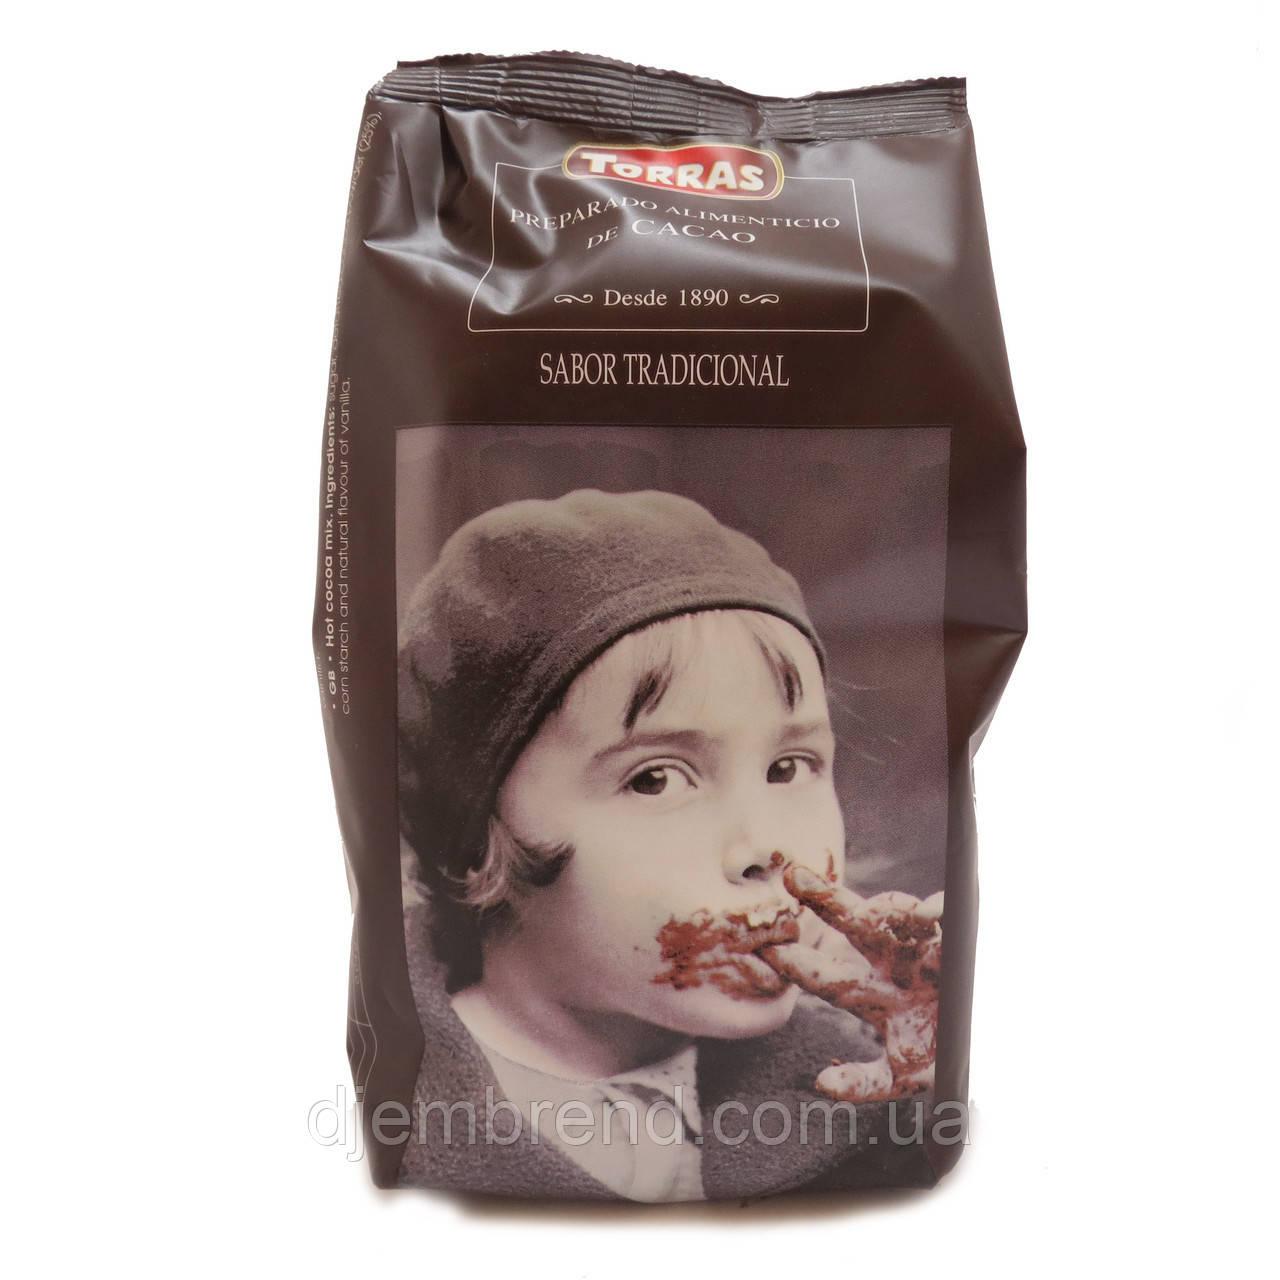 Горячий какао Torras Испания 180 г.